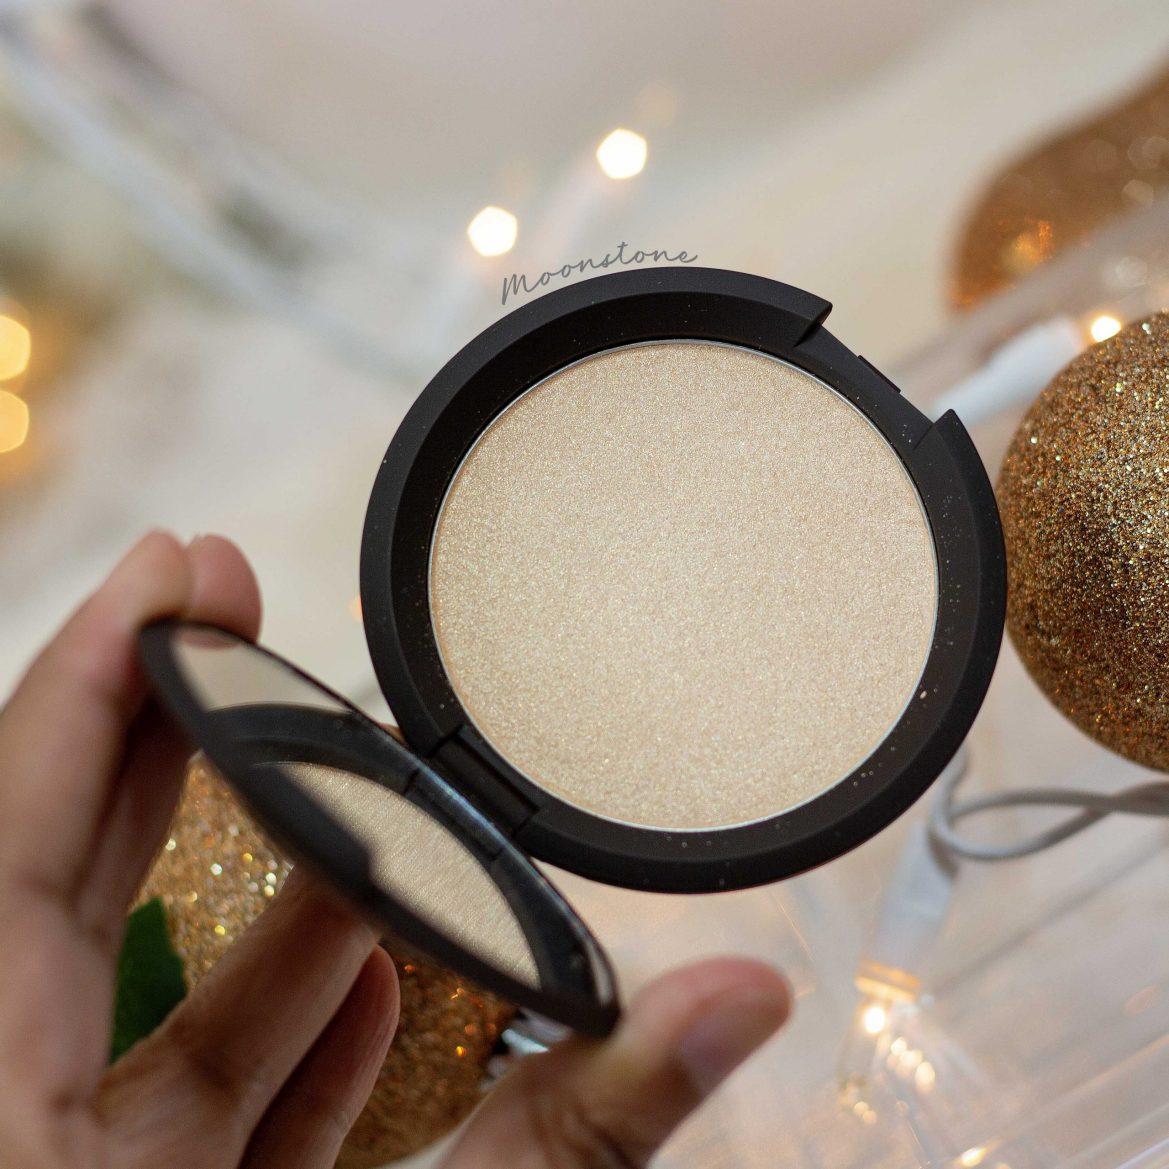 BECCA Shimmering Skin Perfector- moonstone